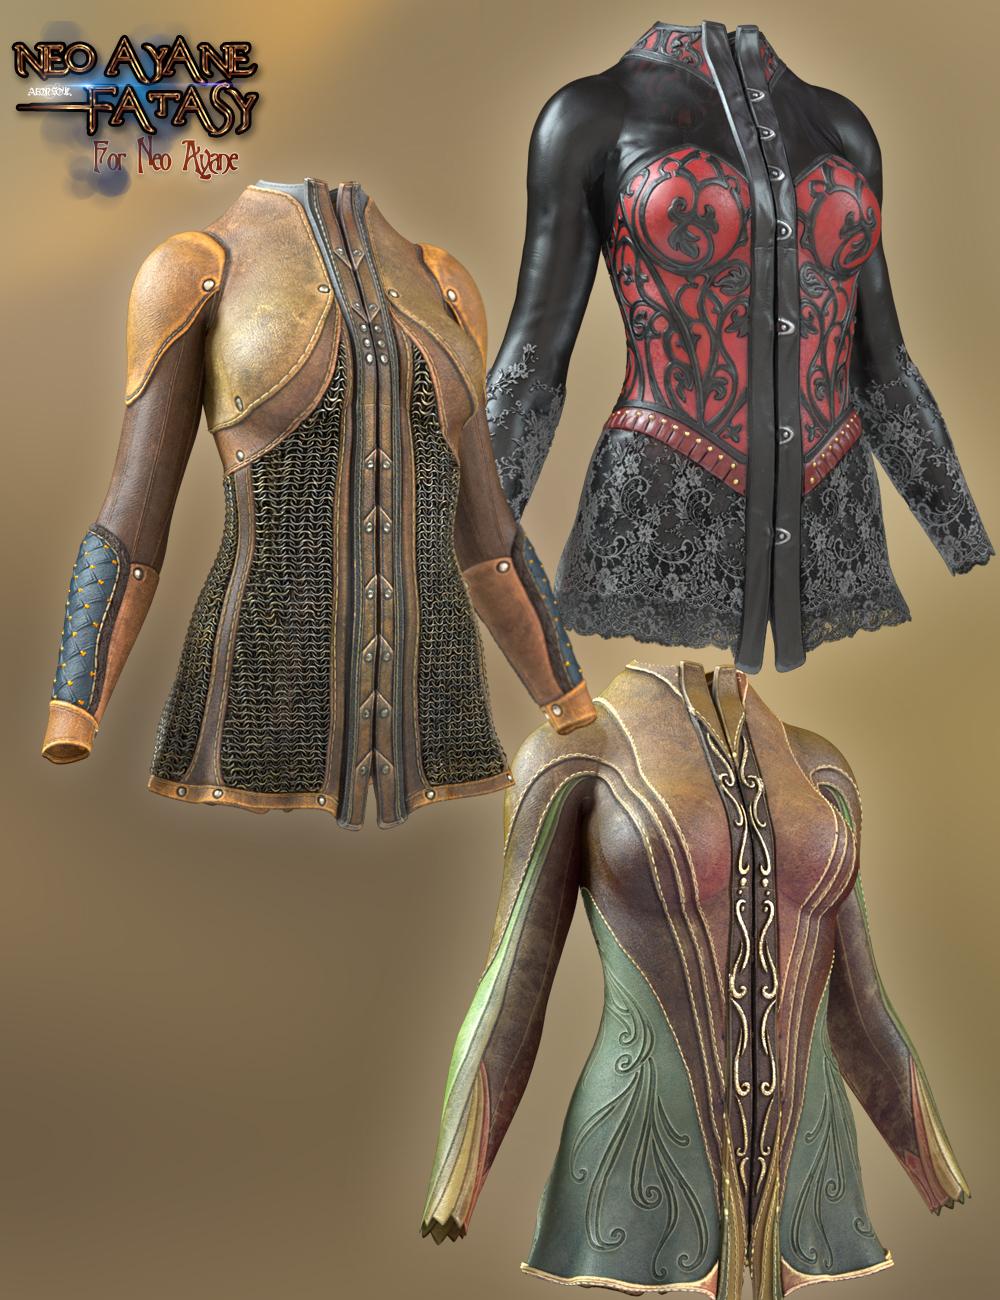 Neo Ayane Fantasy by: Aeon Soul, 3D Models by Daz 3D